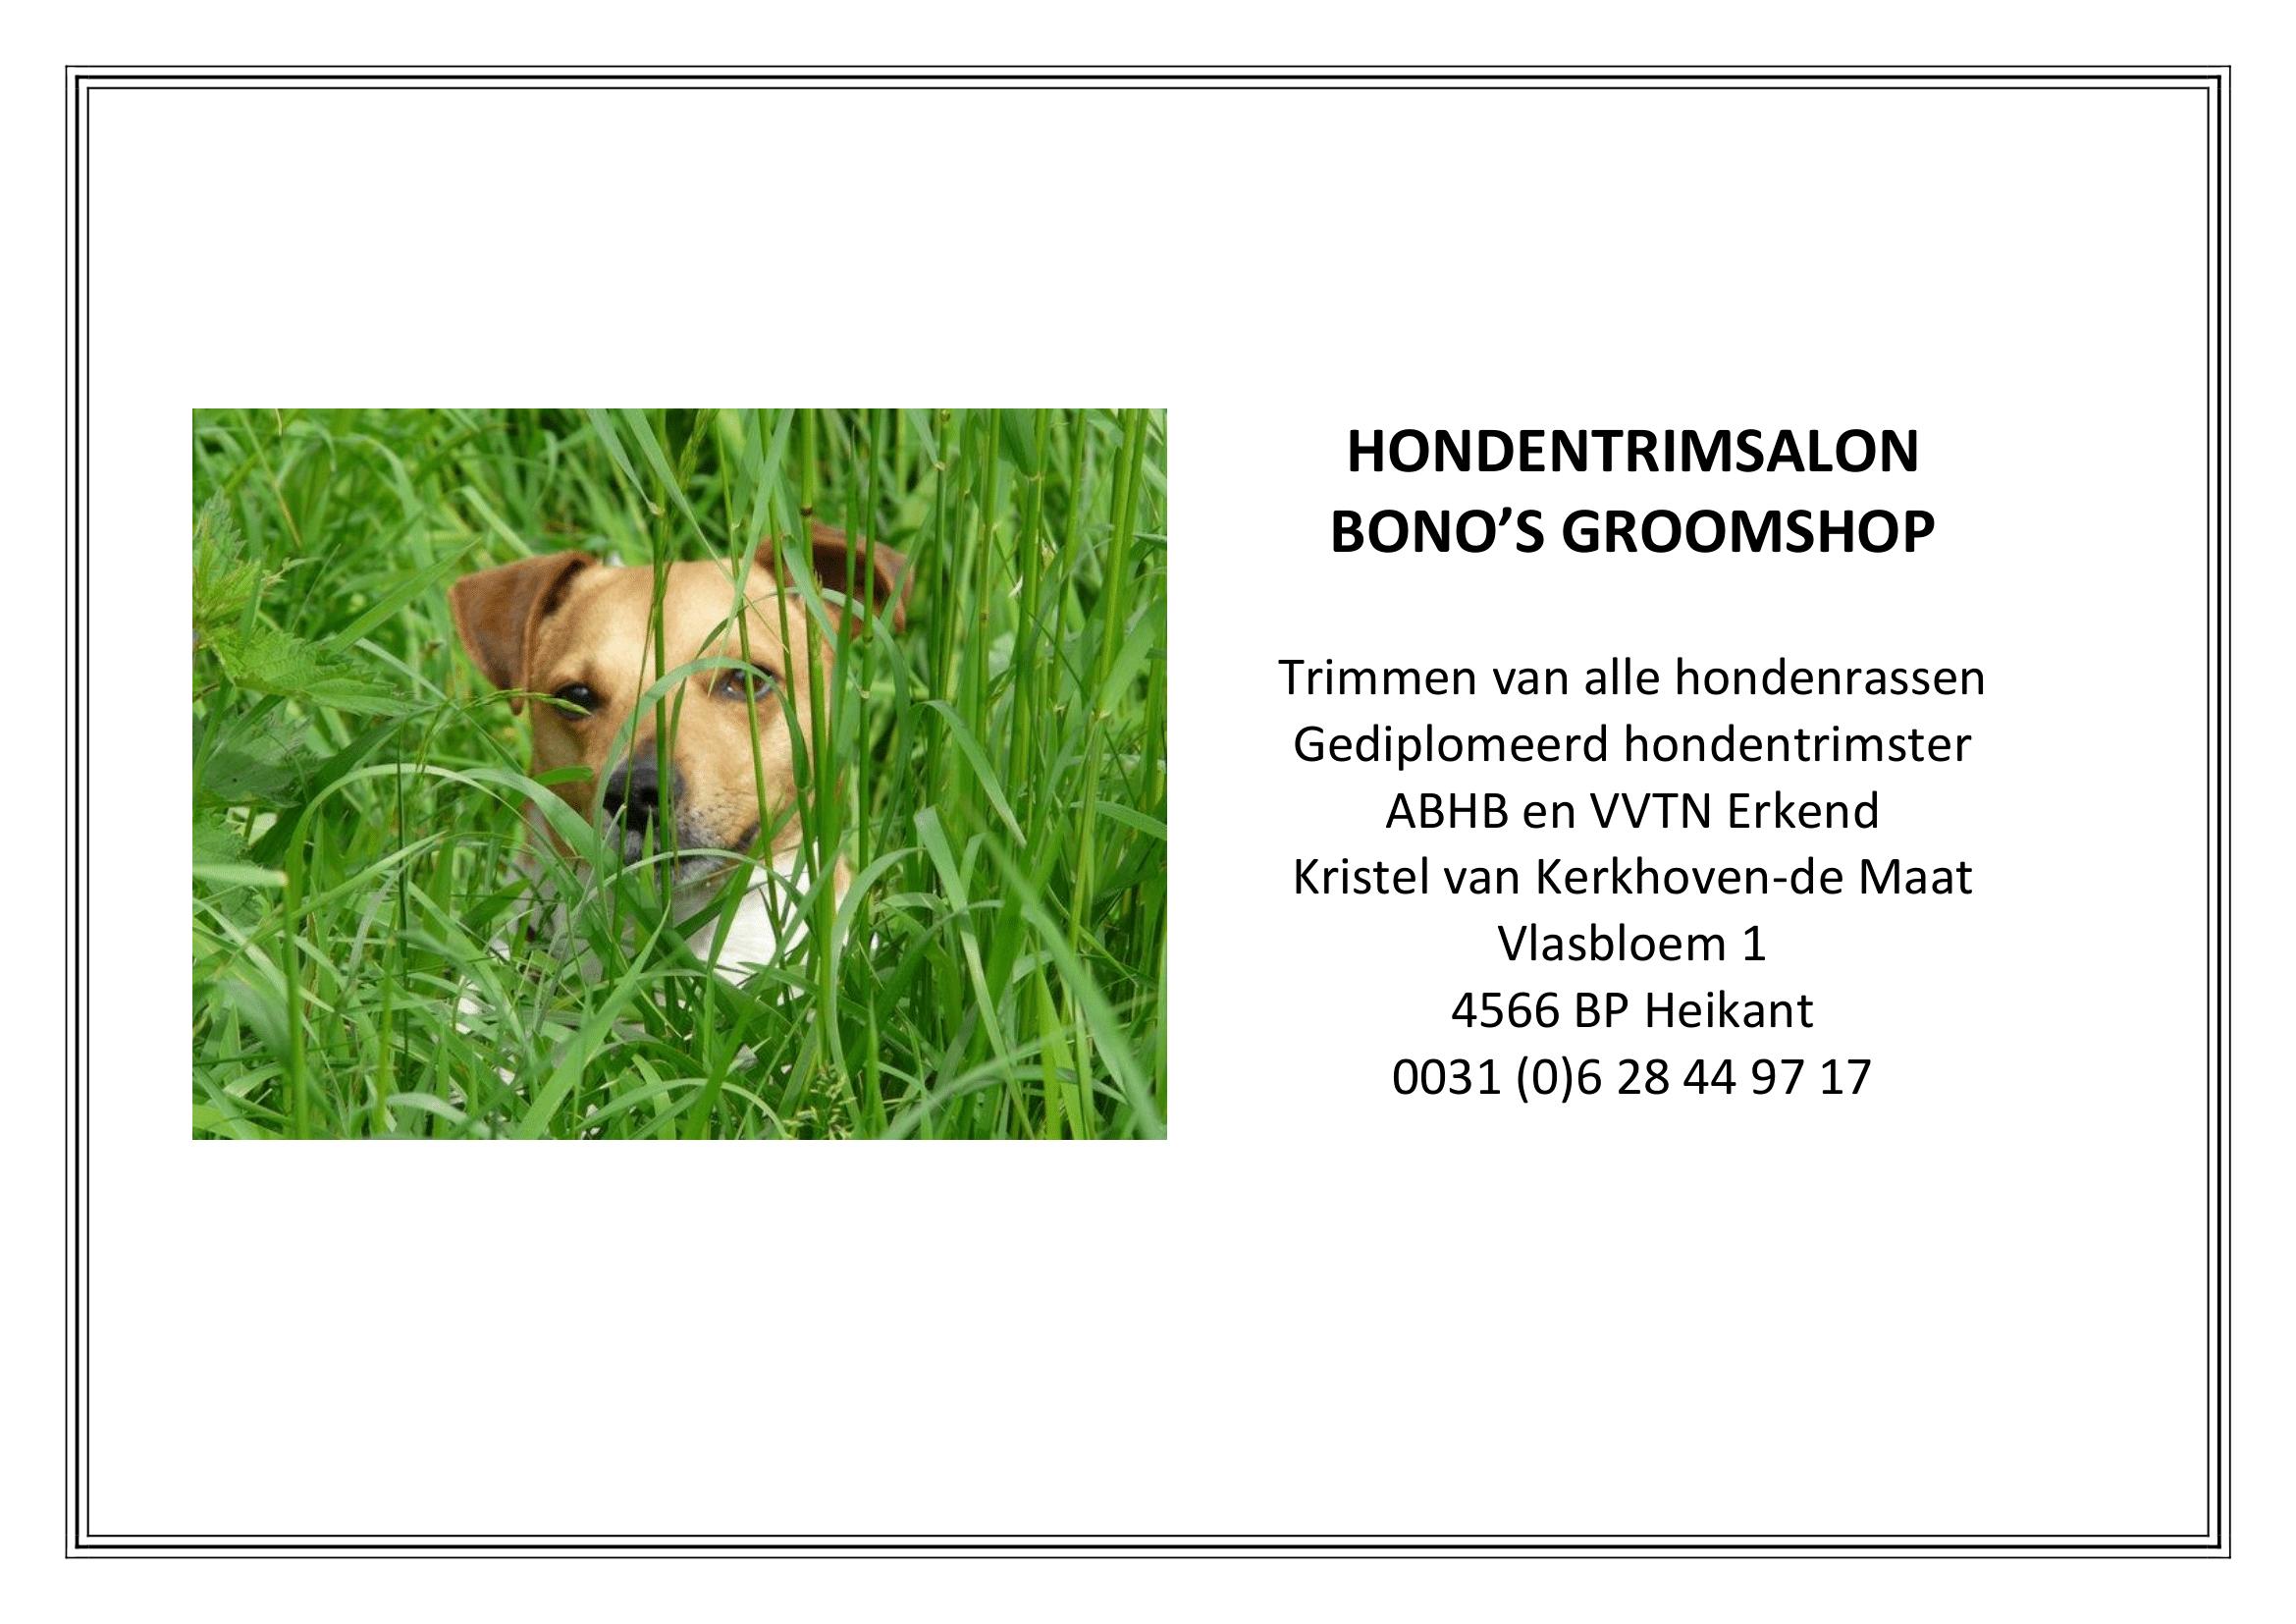 Bono's groomshop